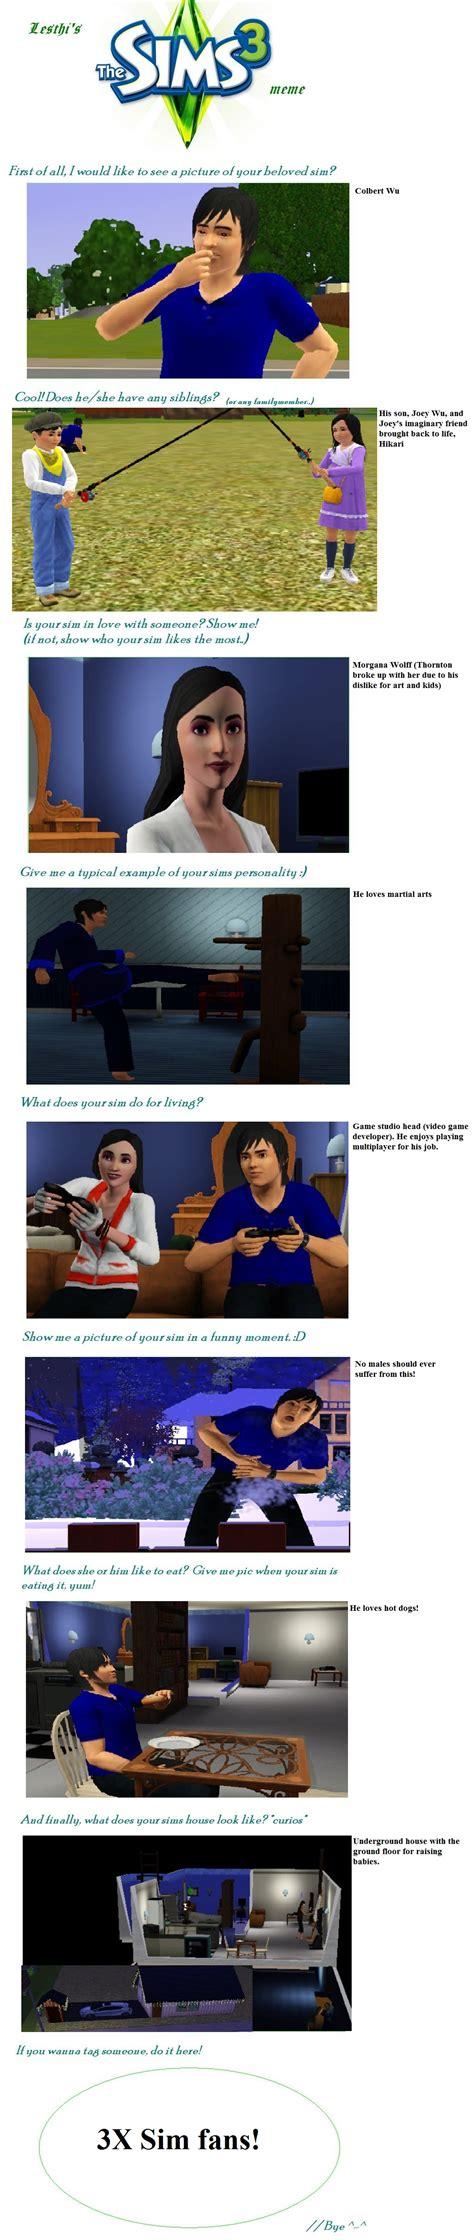 Sims 3 Memes - sims 3 meme by proudorcs on deviantart